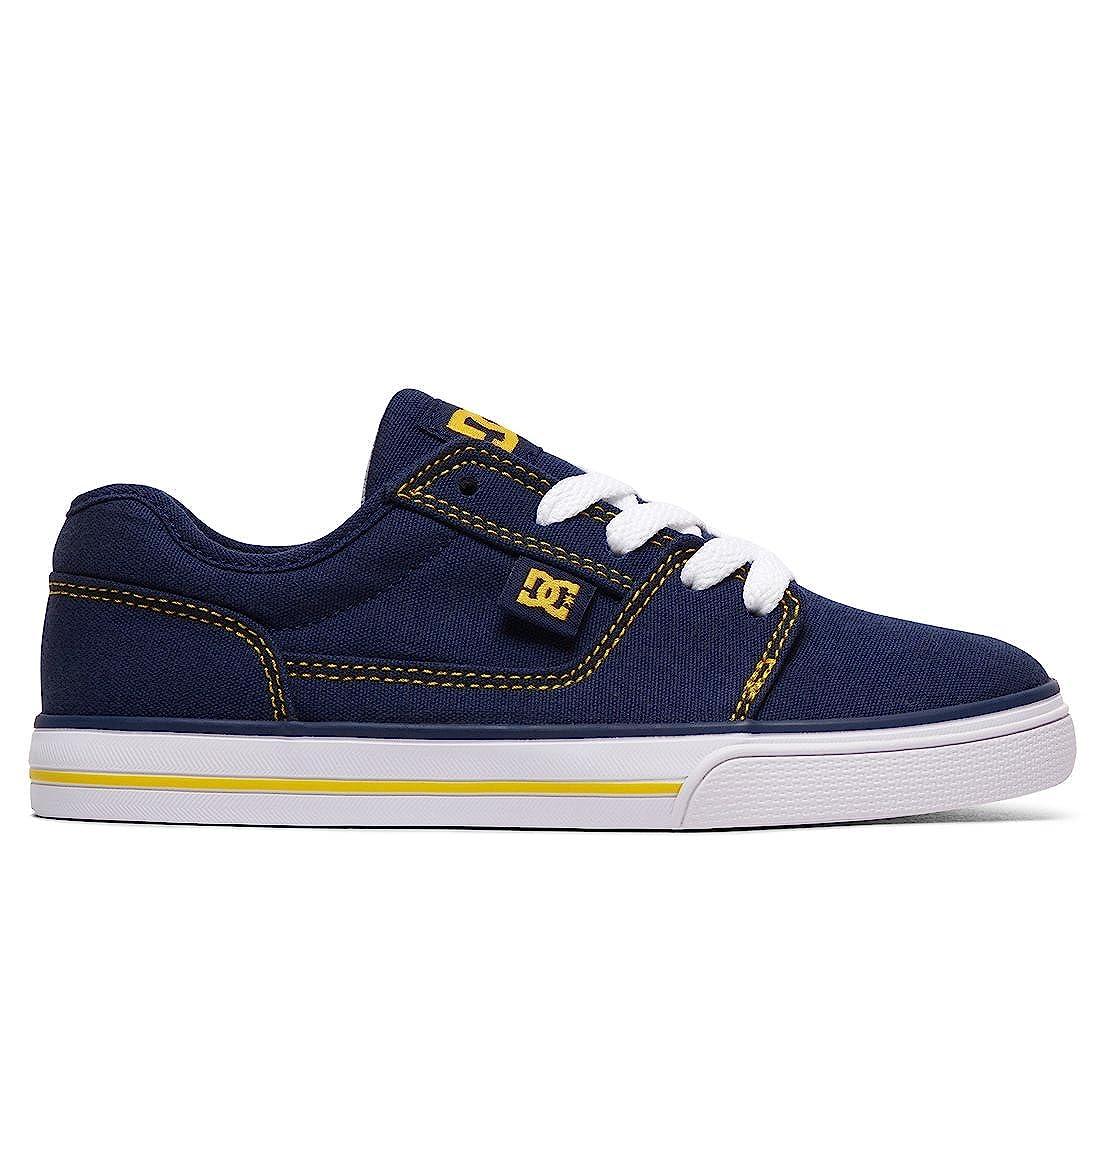 DC Tonik Tx B, Boys' Sneakers DC Shoes Boys' Sneakers ADBS300271